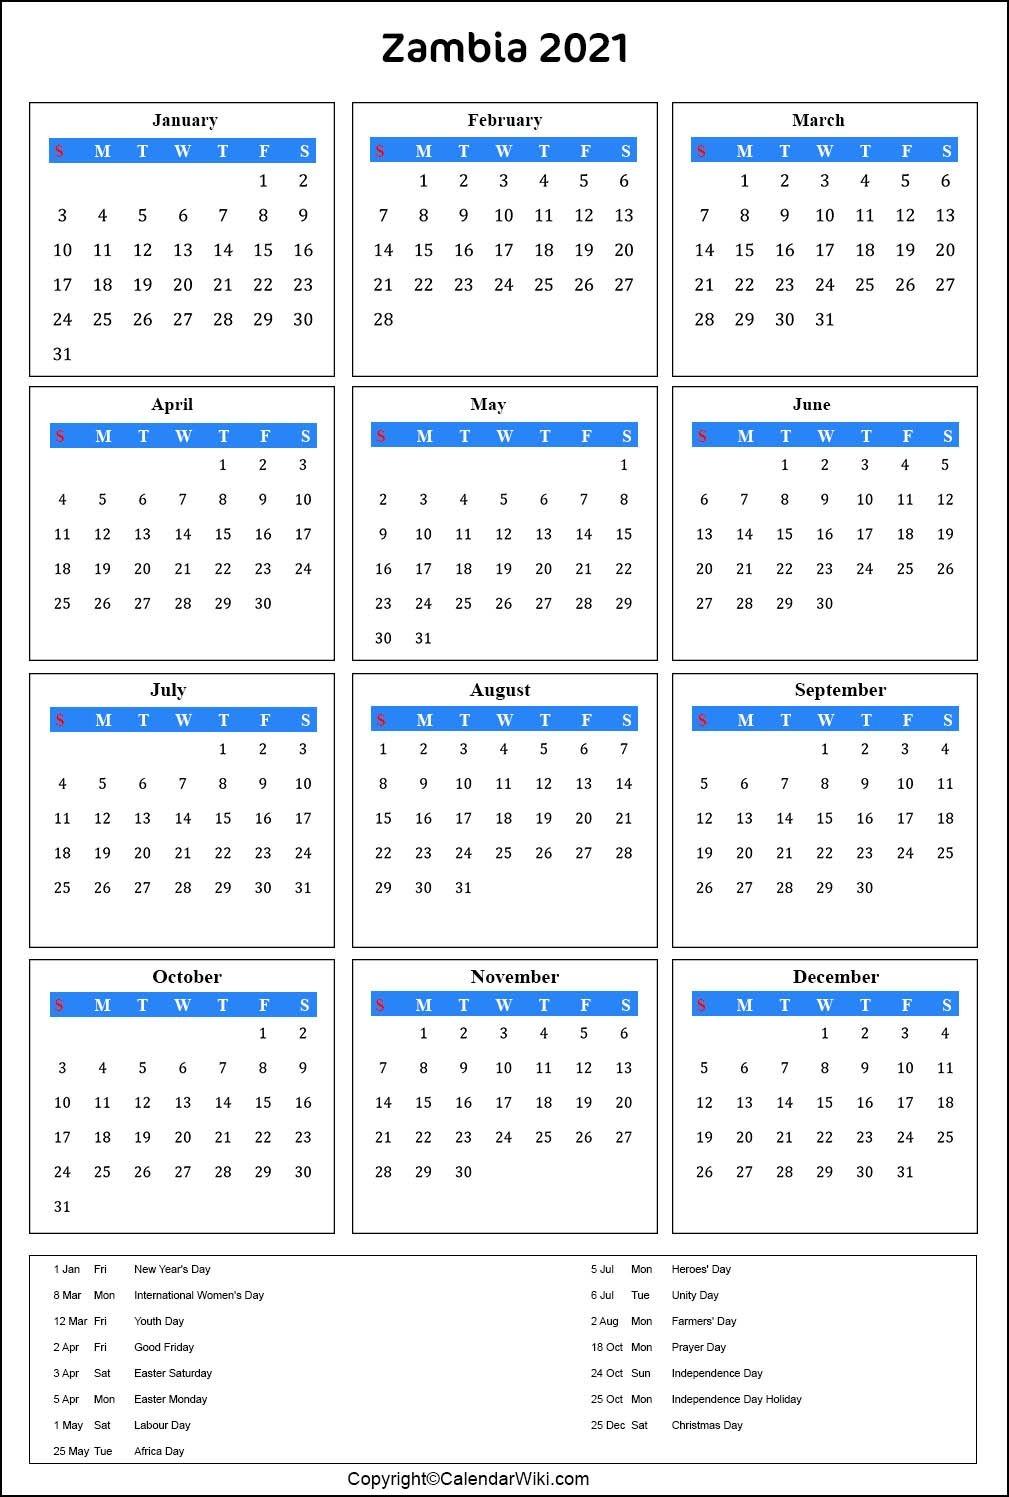 Printable Zambia Calendar 2021 With Holidays [public Holidays]